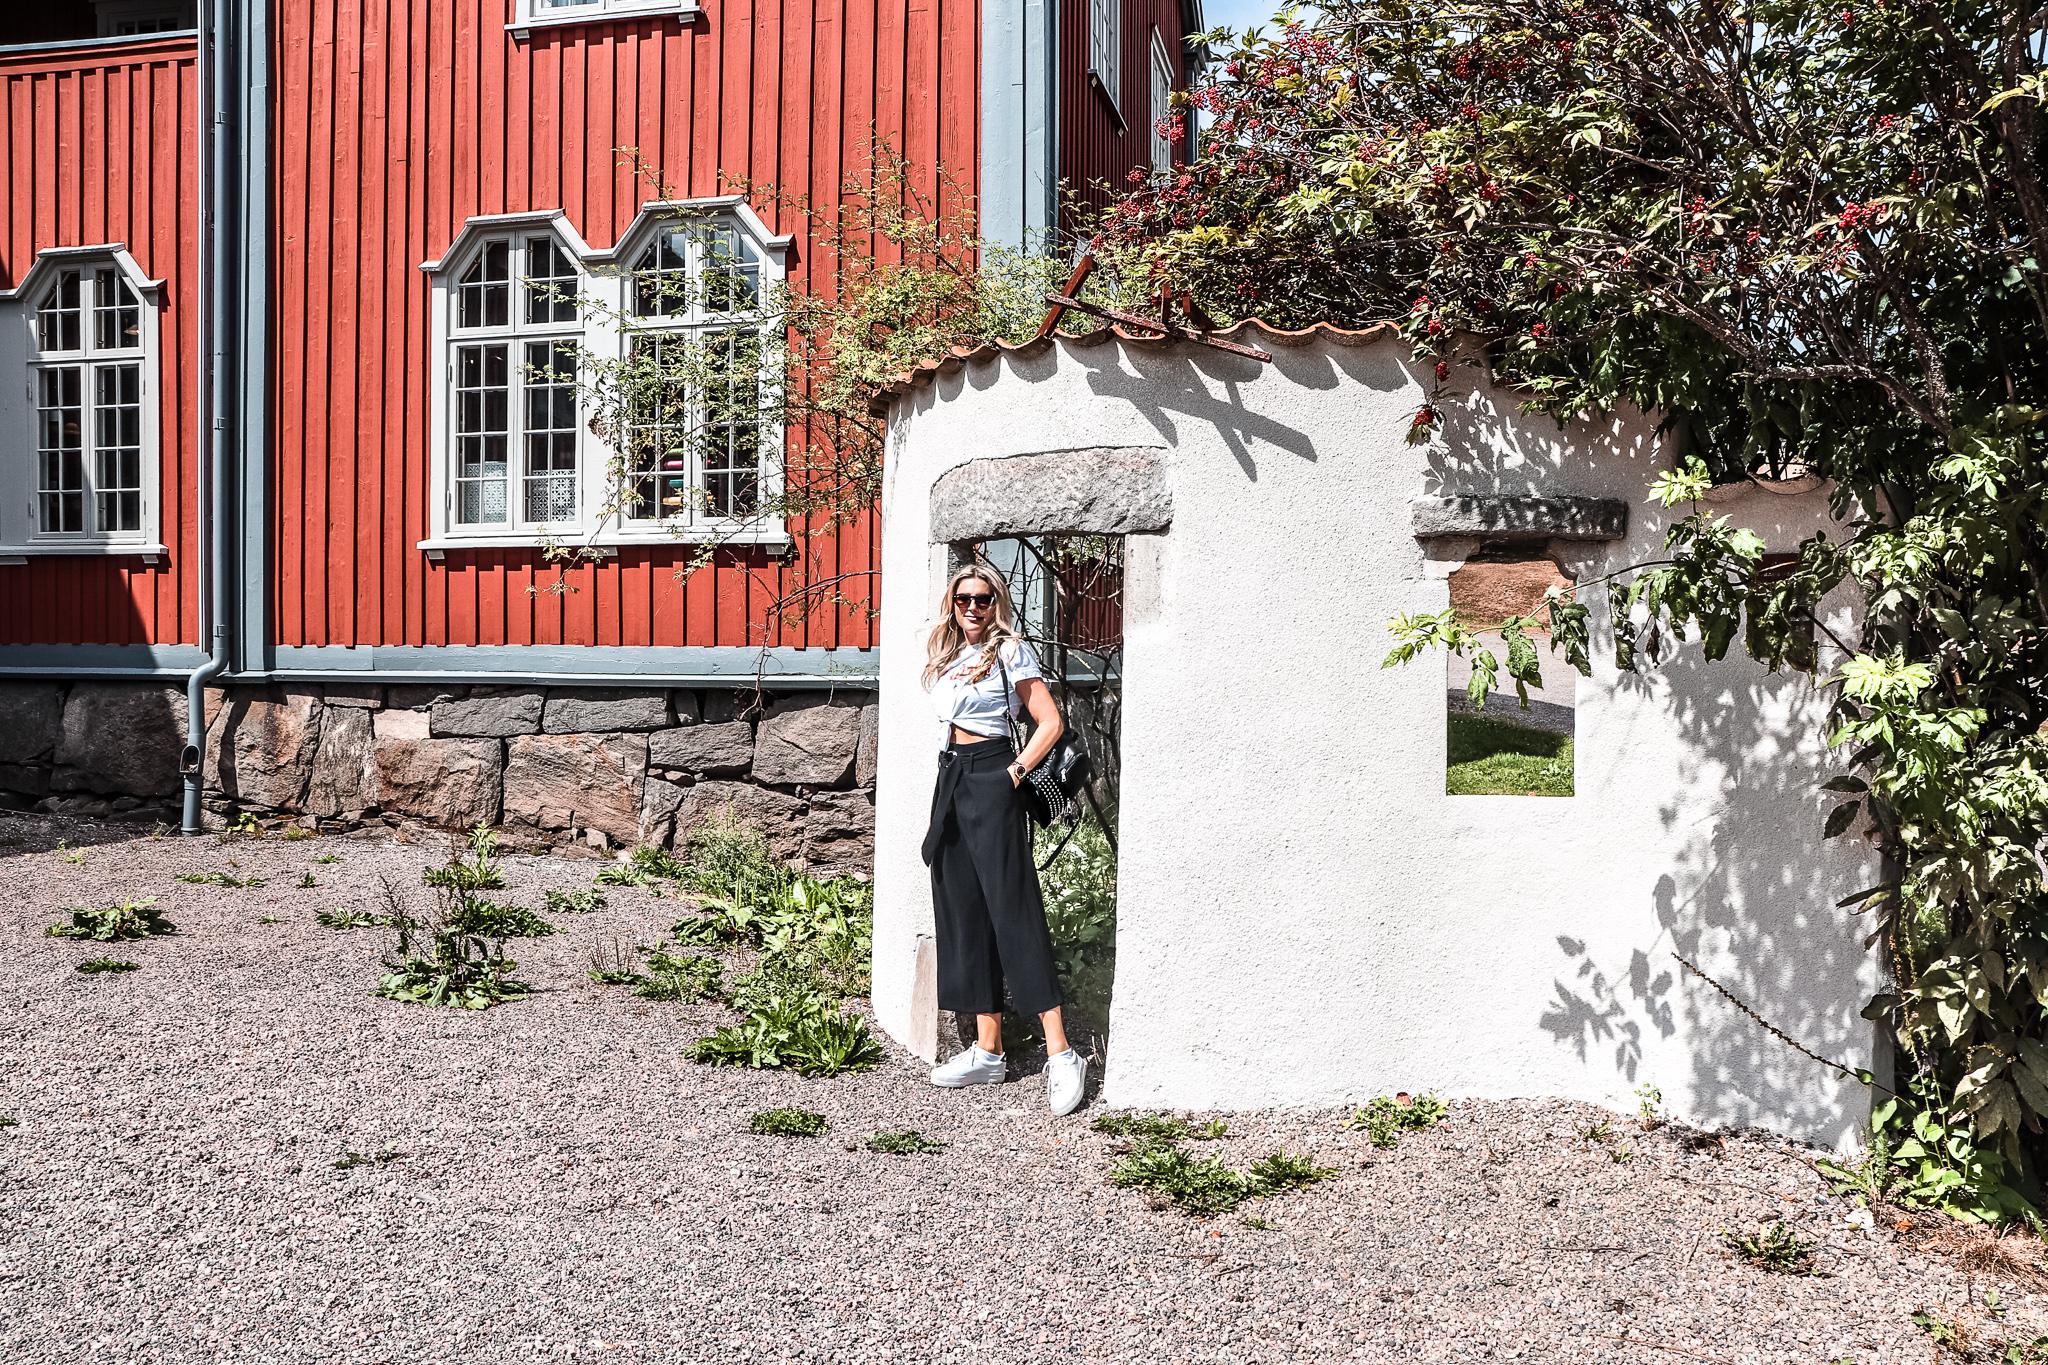 Modebloggare Göteborg, dagens outfit, byxan, Nääs Slott.